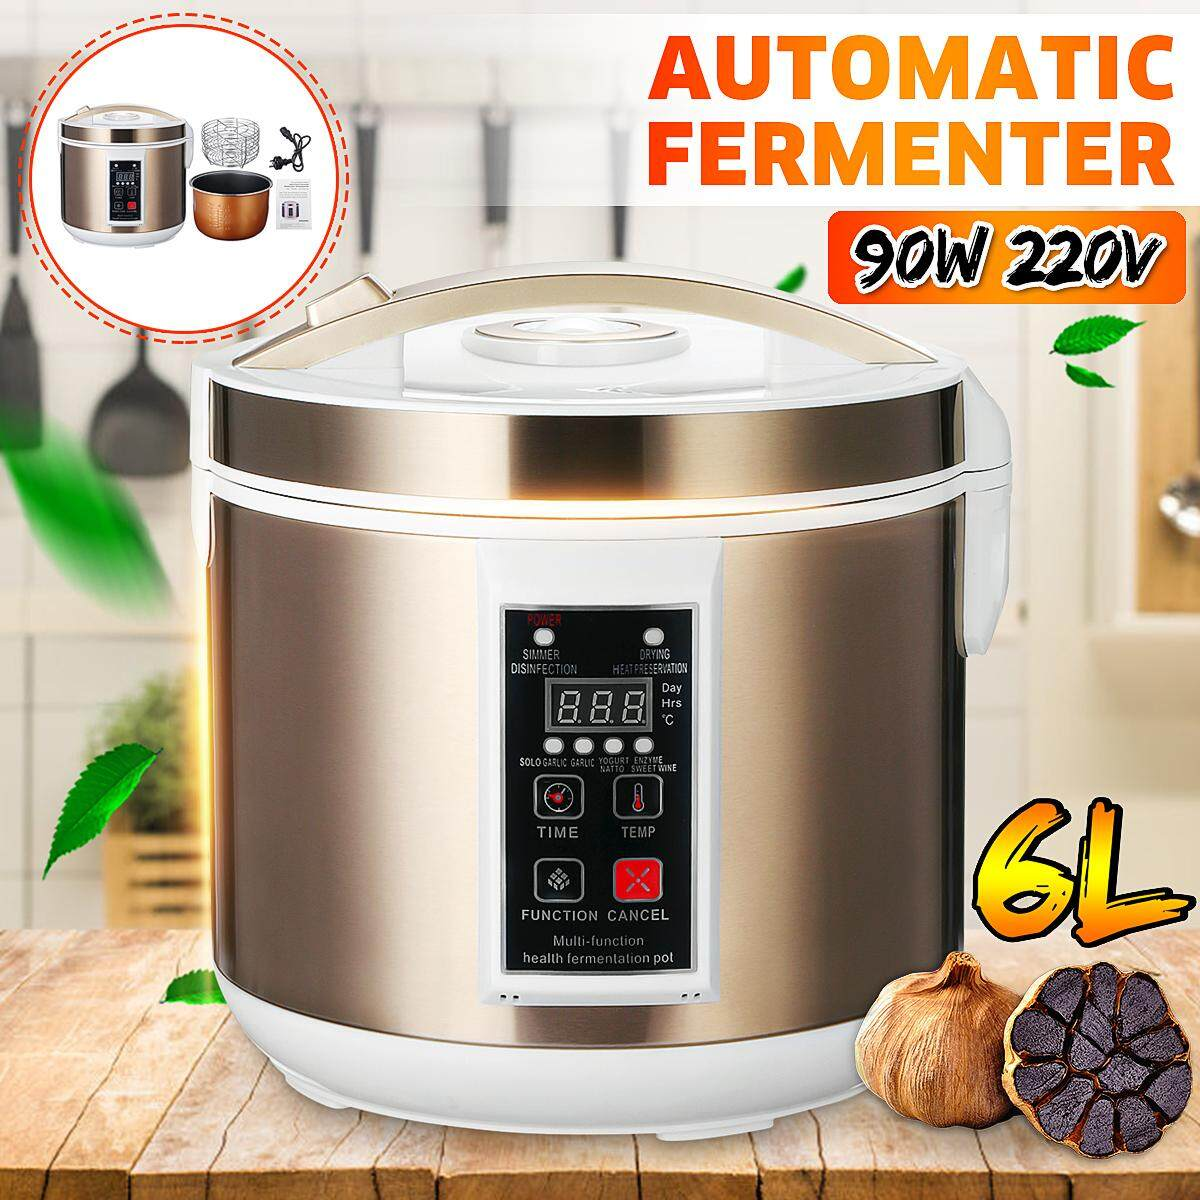 6l 90w Automatic Black Garlic Fermenter Ferment Garlic Yogurt Natto Wine Maker By Audew.